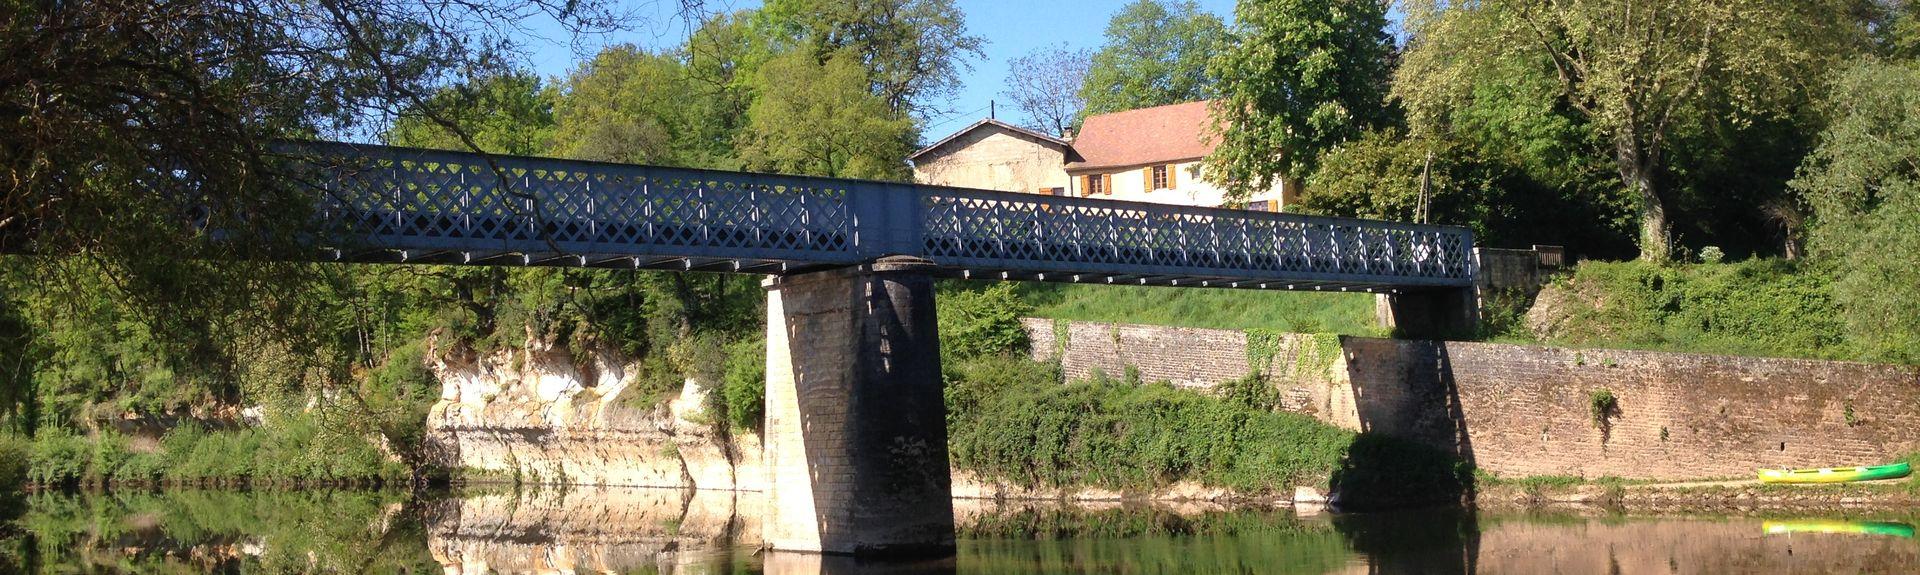 Audrix, Dordogne, France